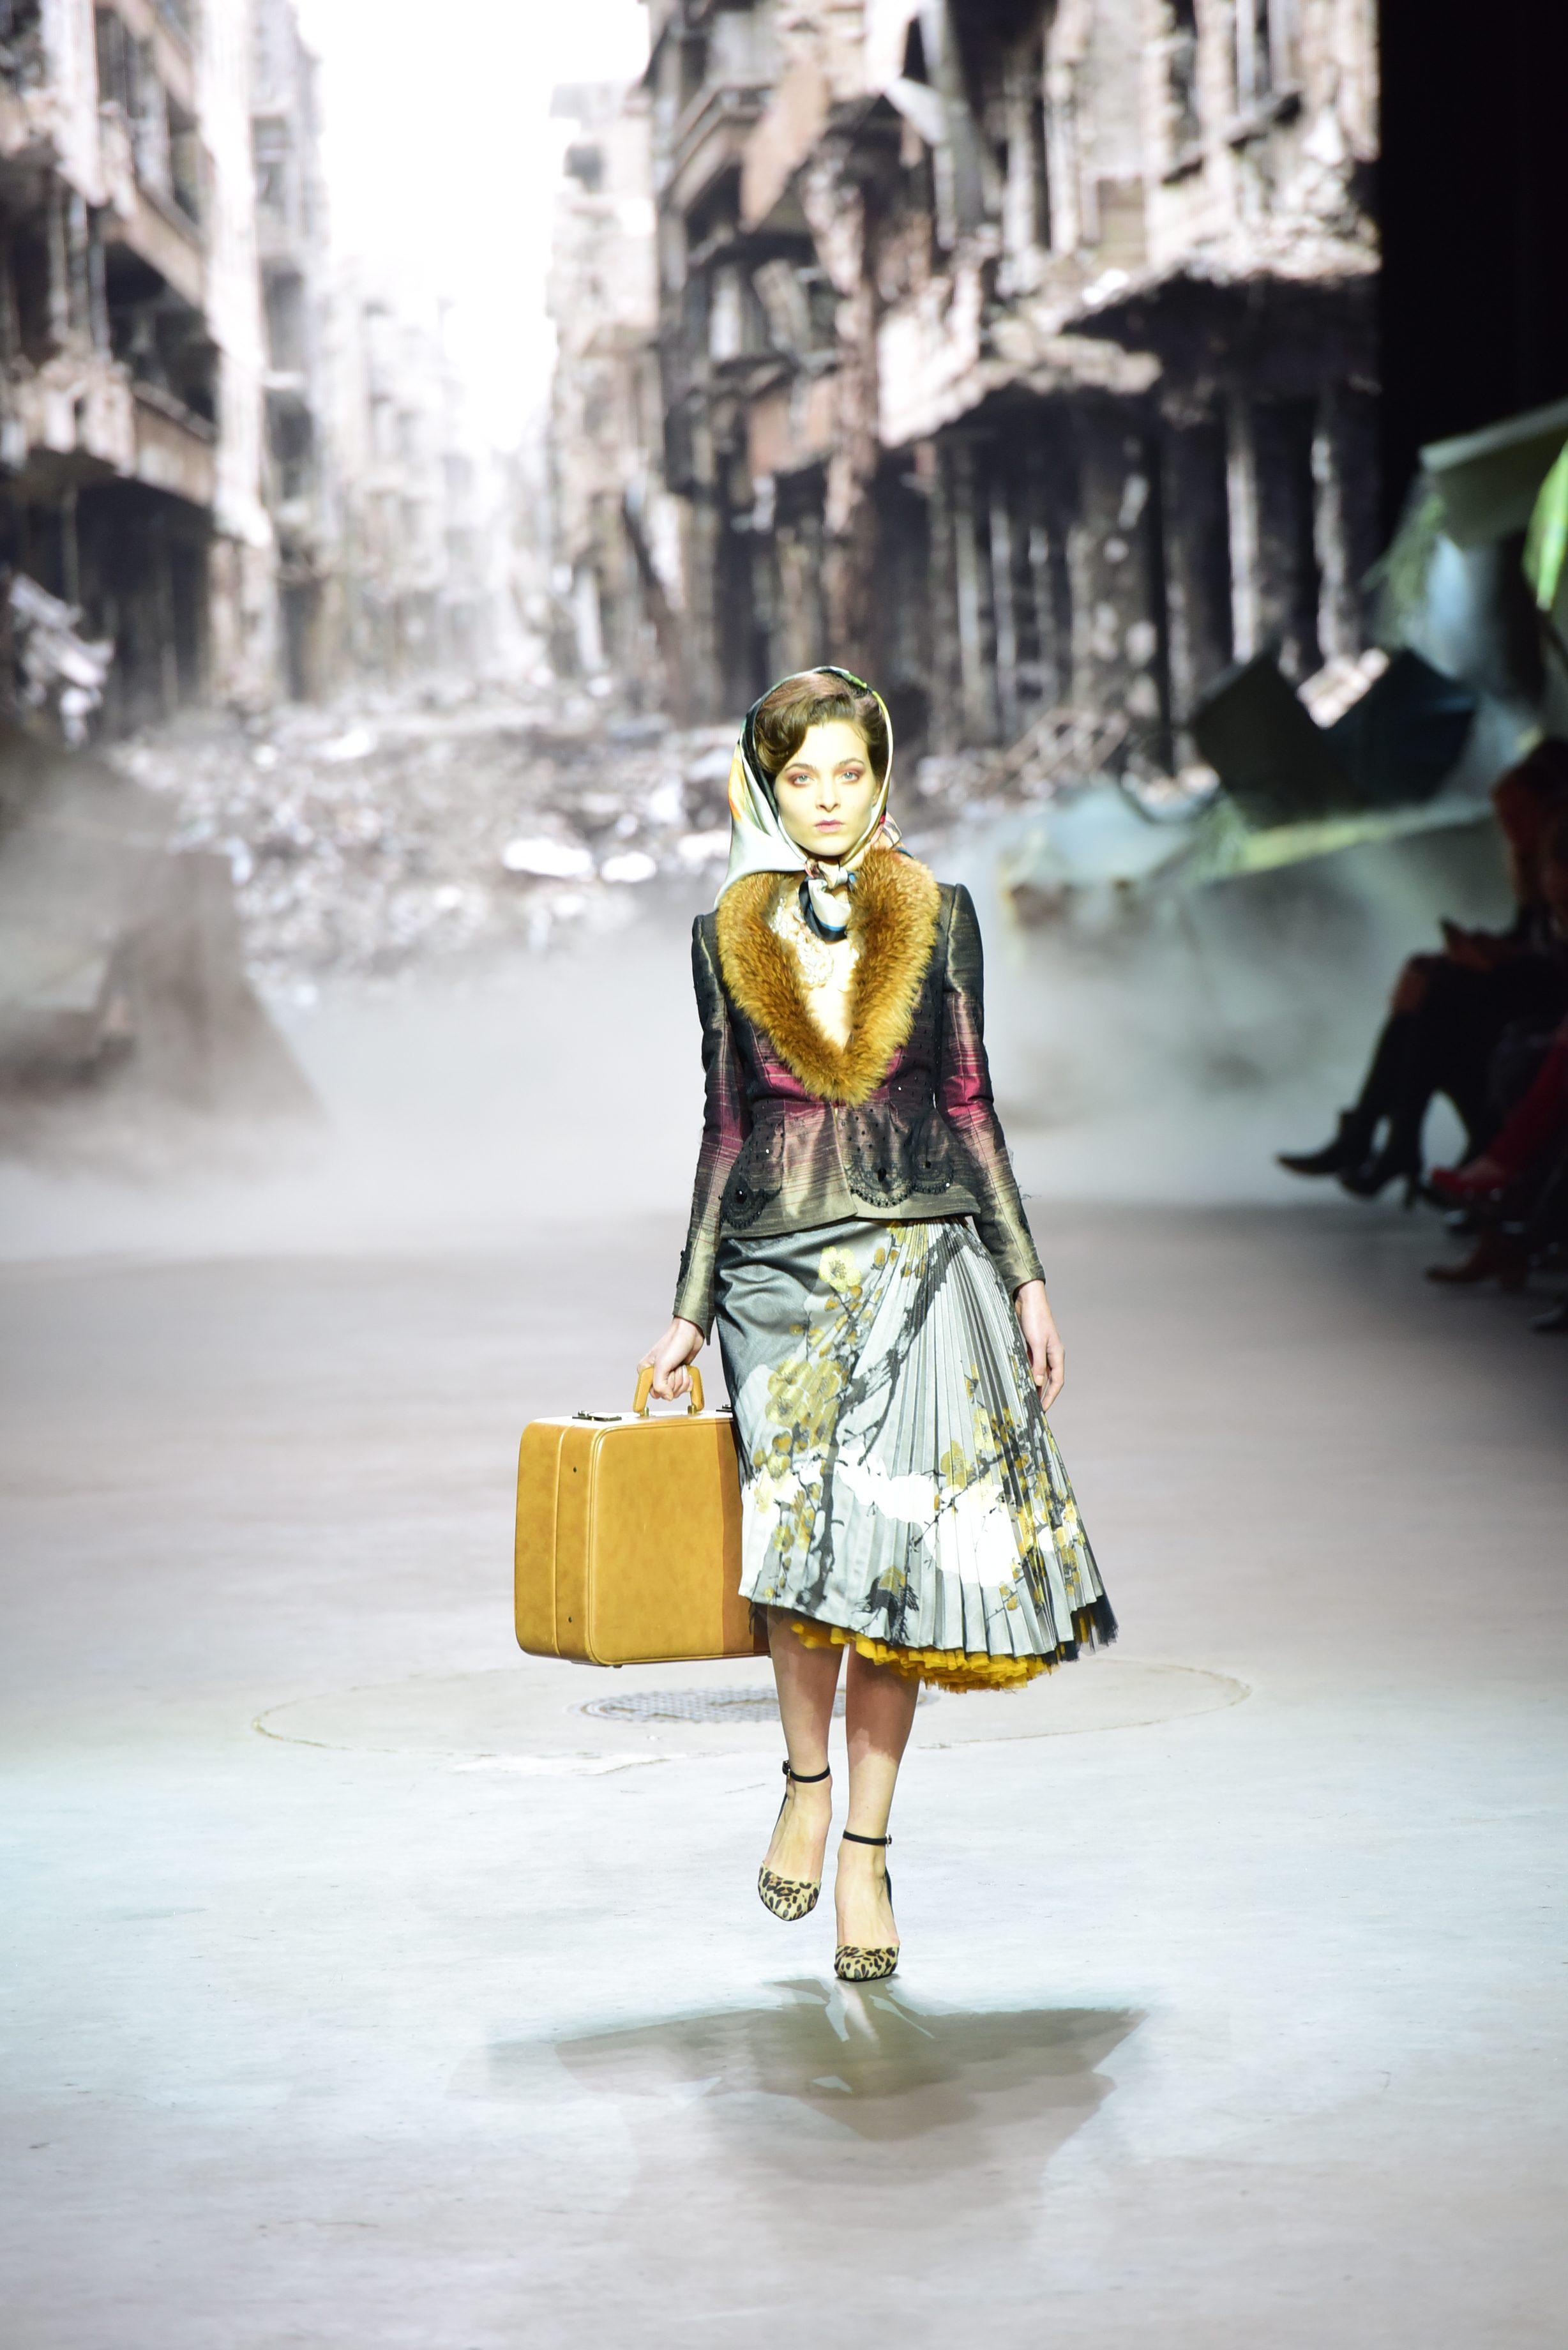 International amsterdam fashion week fall advise dress for spring in 2019